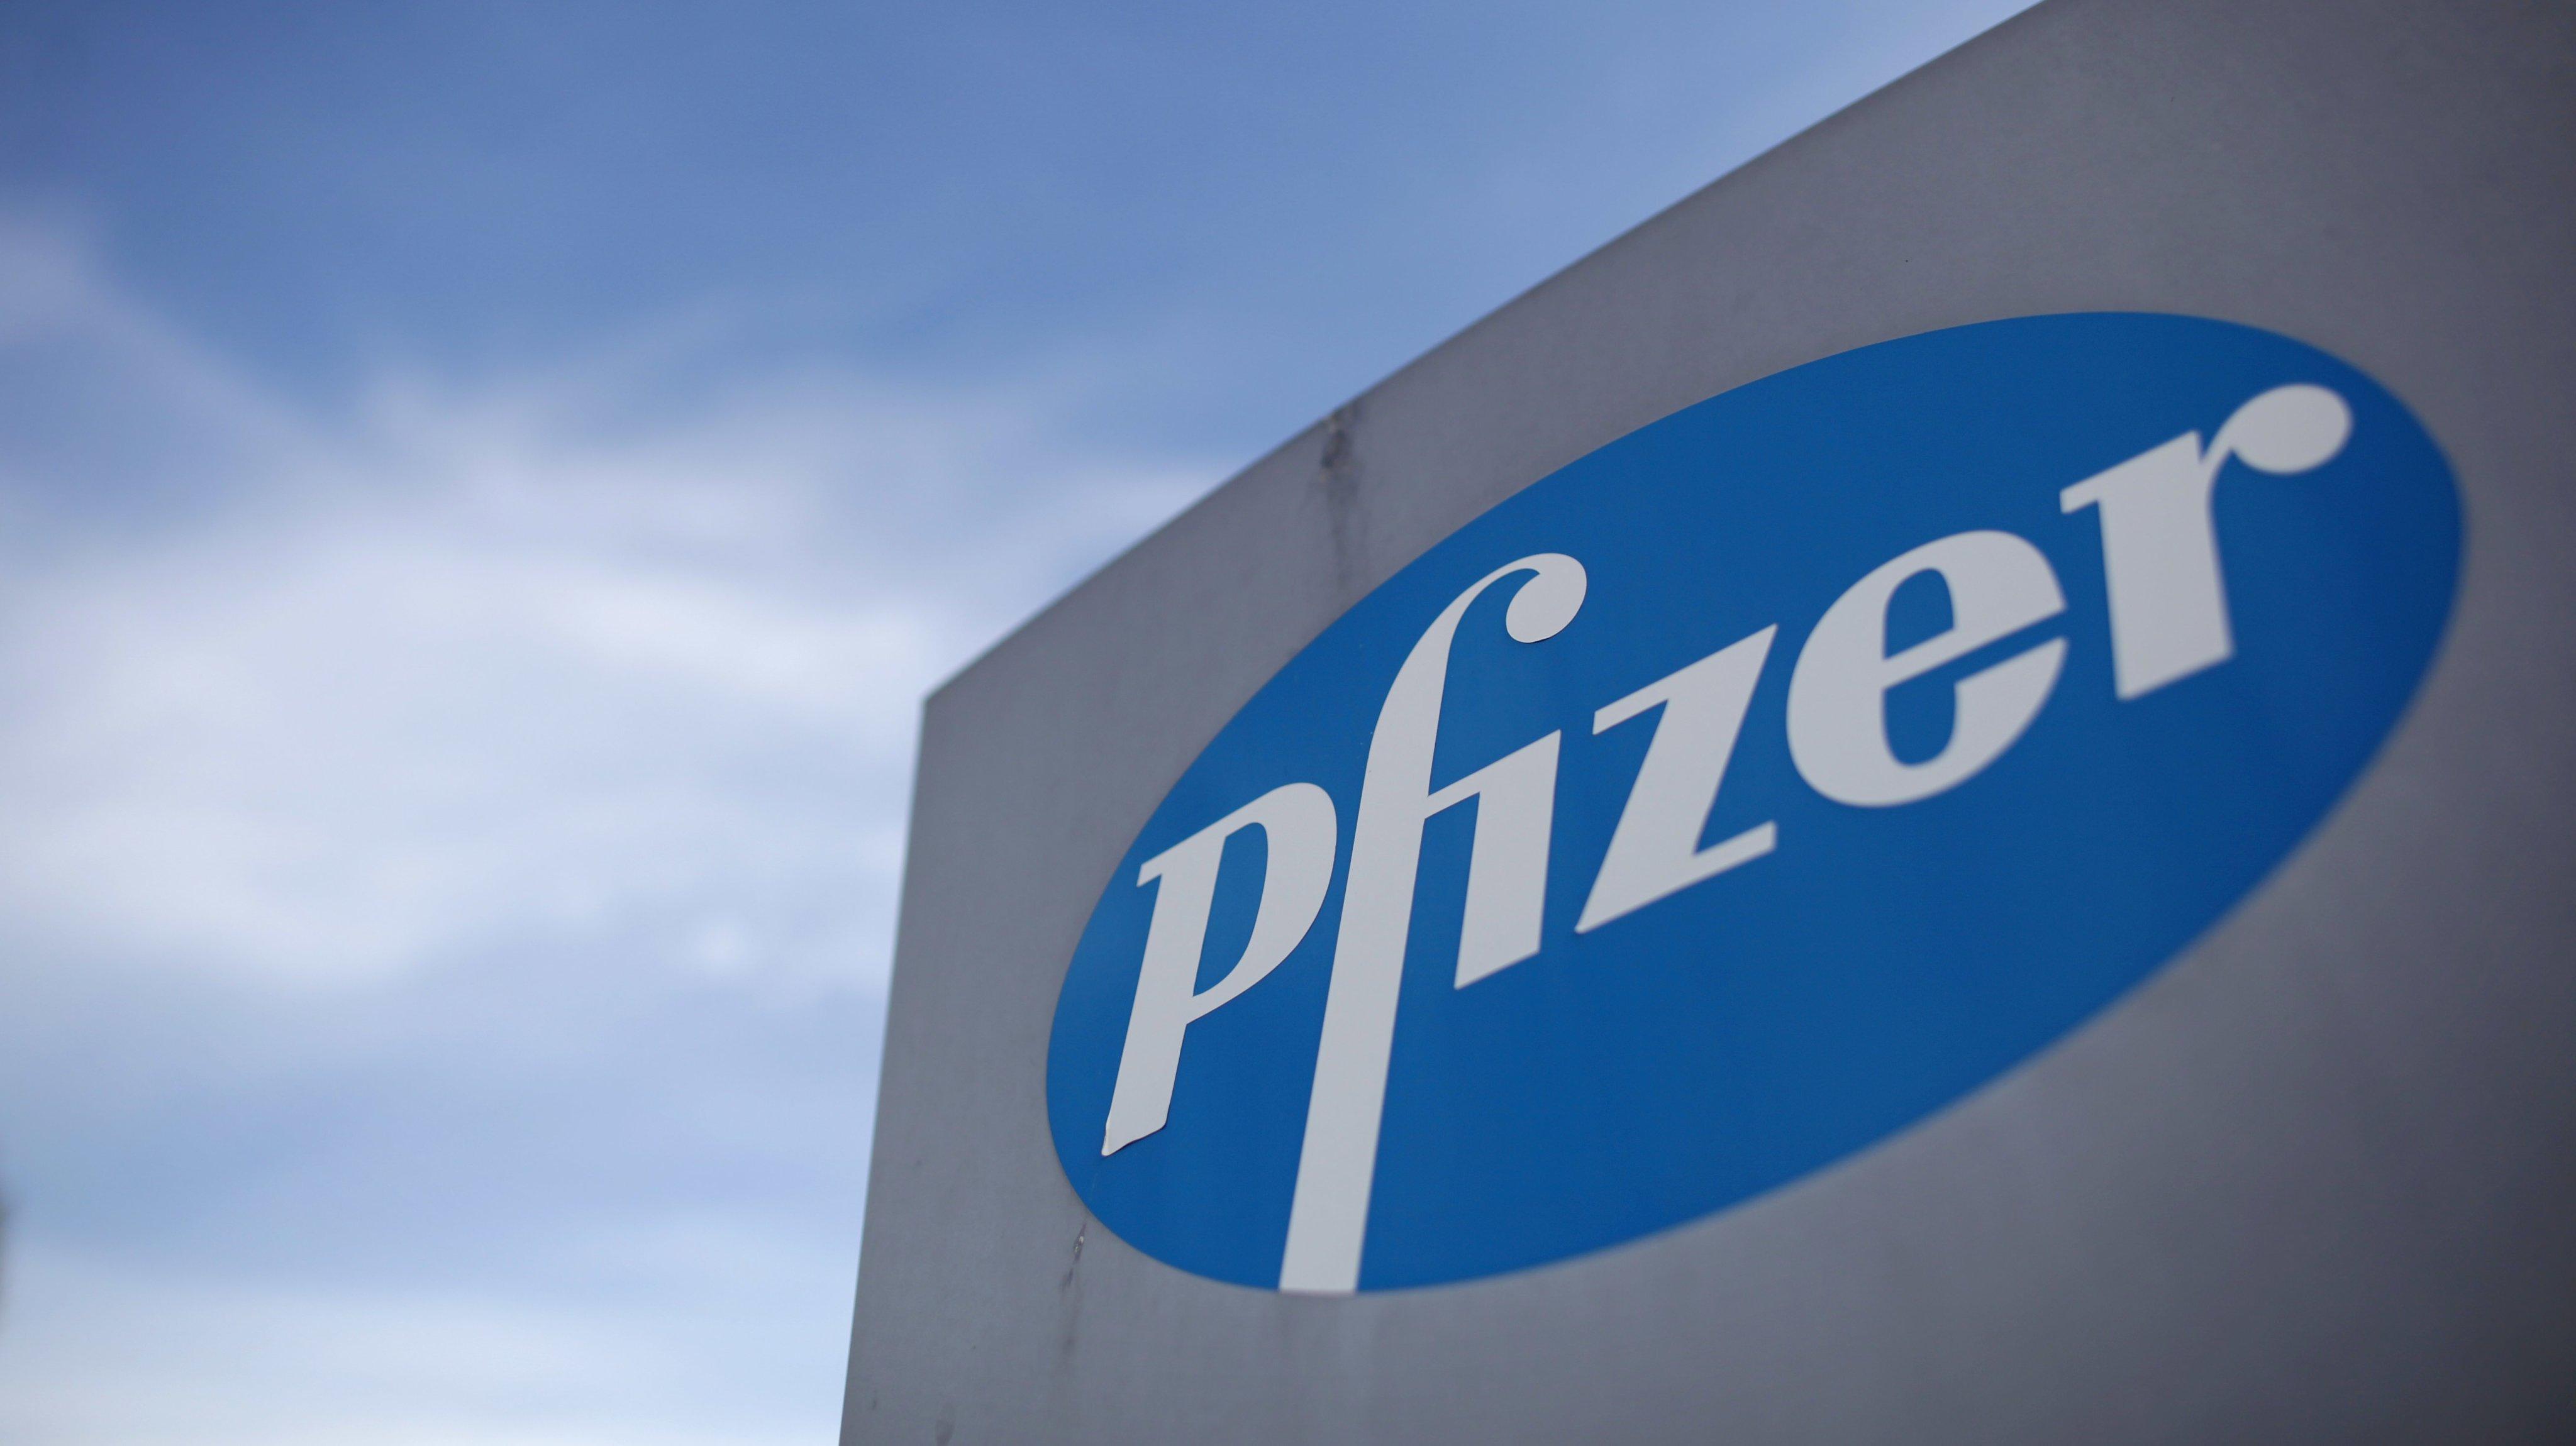 Chancellor George Osborne Visits Pharmaceutical Company Pfizer